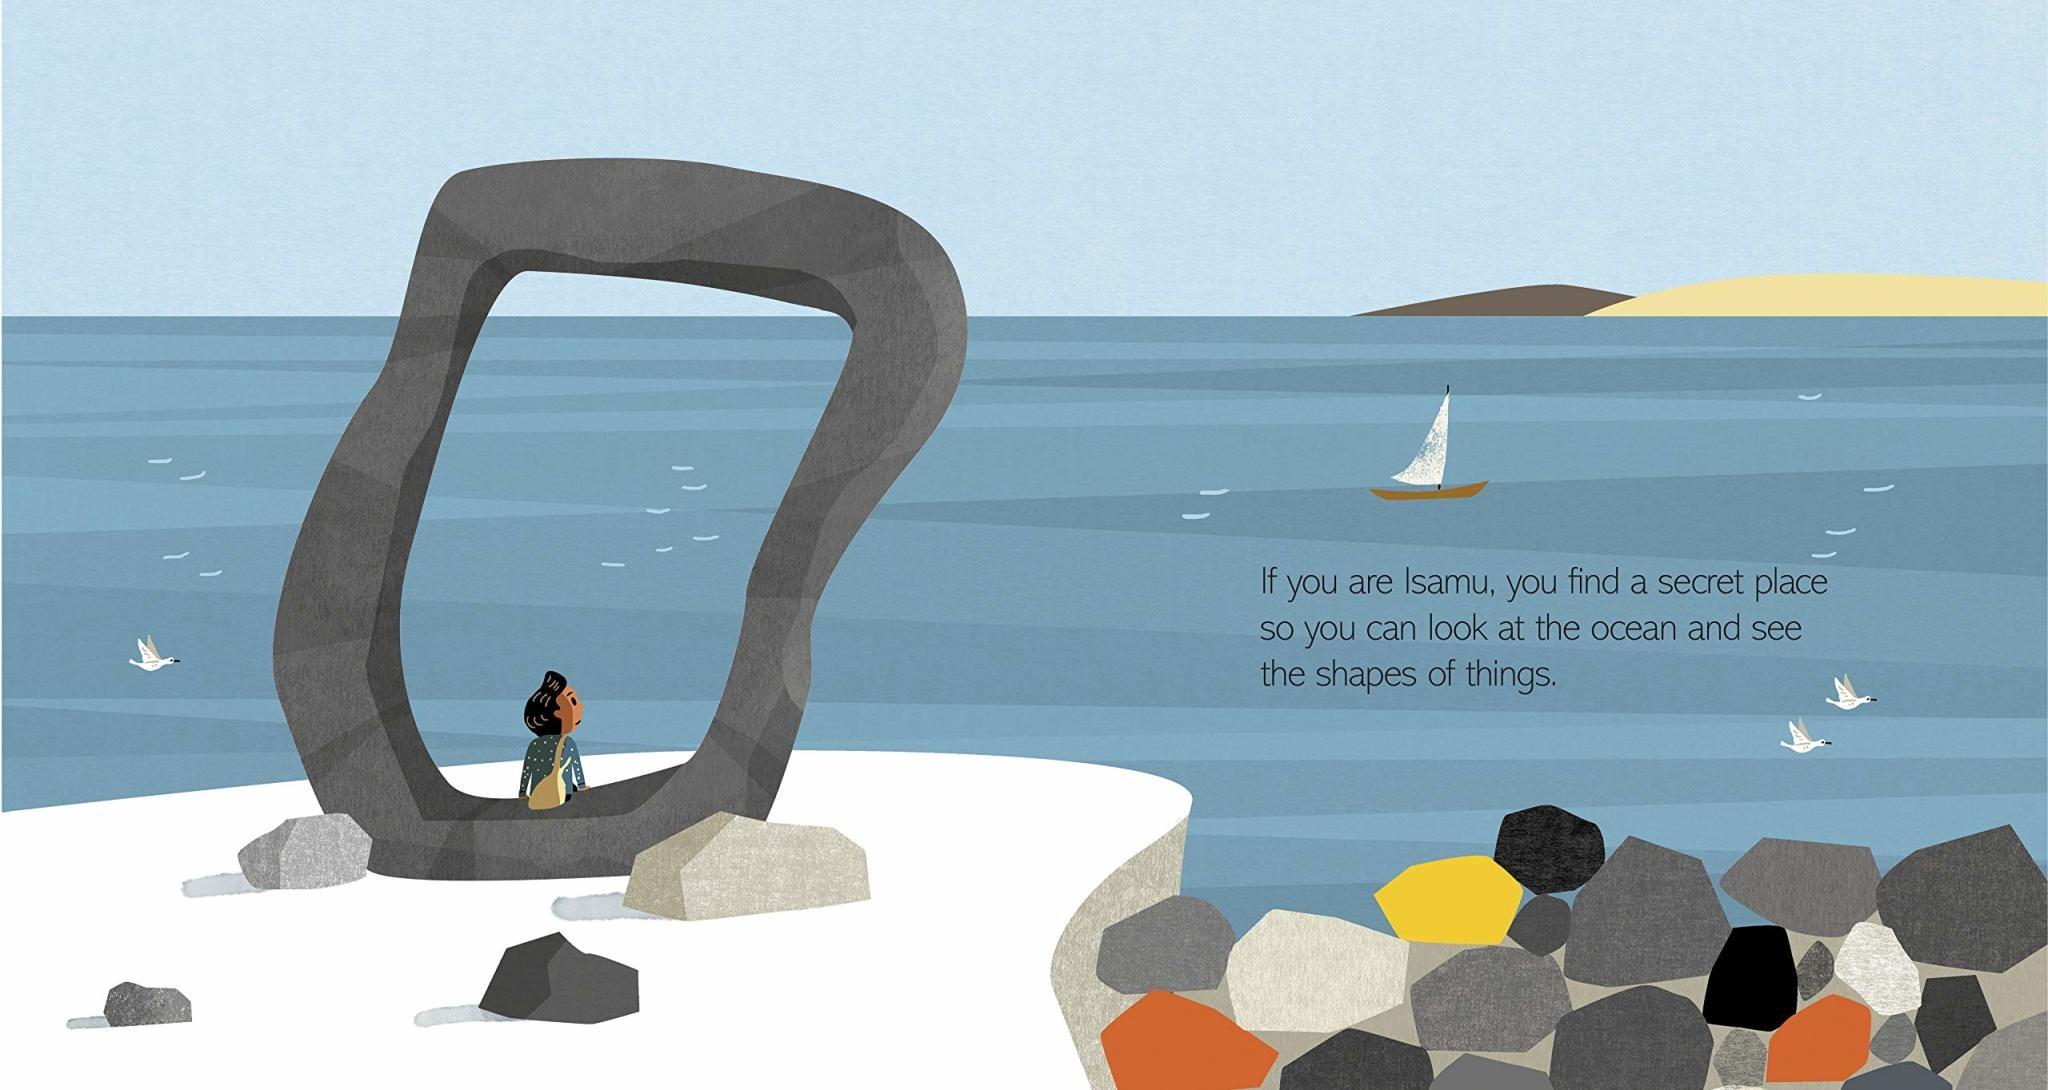 Penguin Random House A Boy Named Isamu